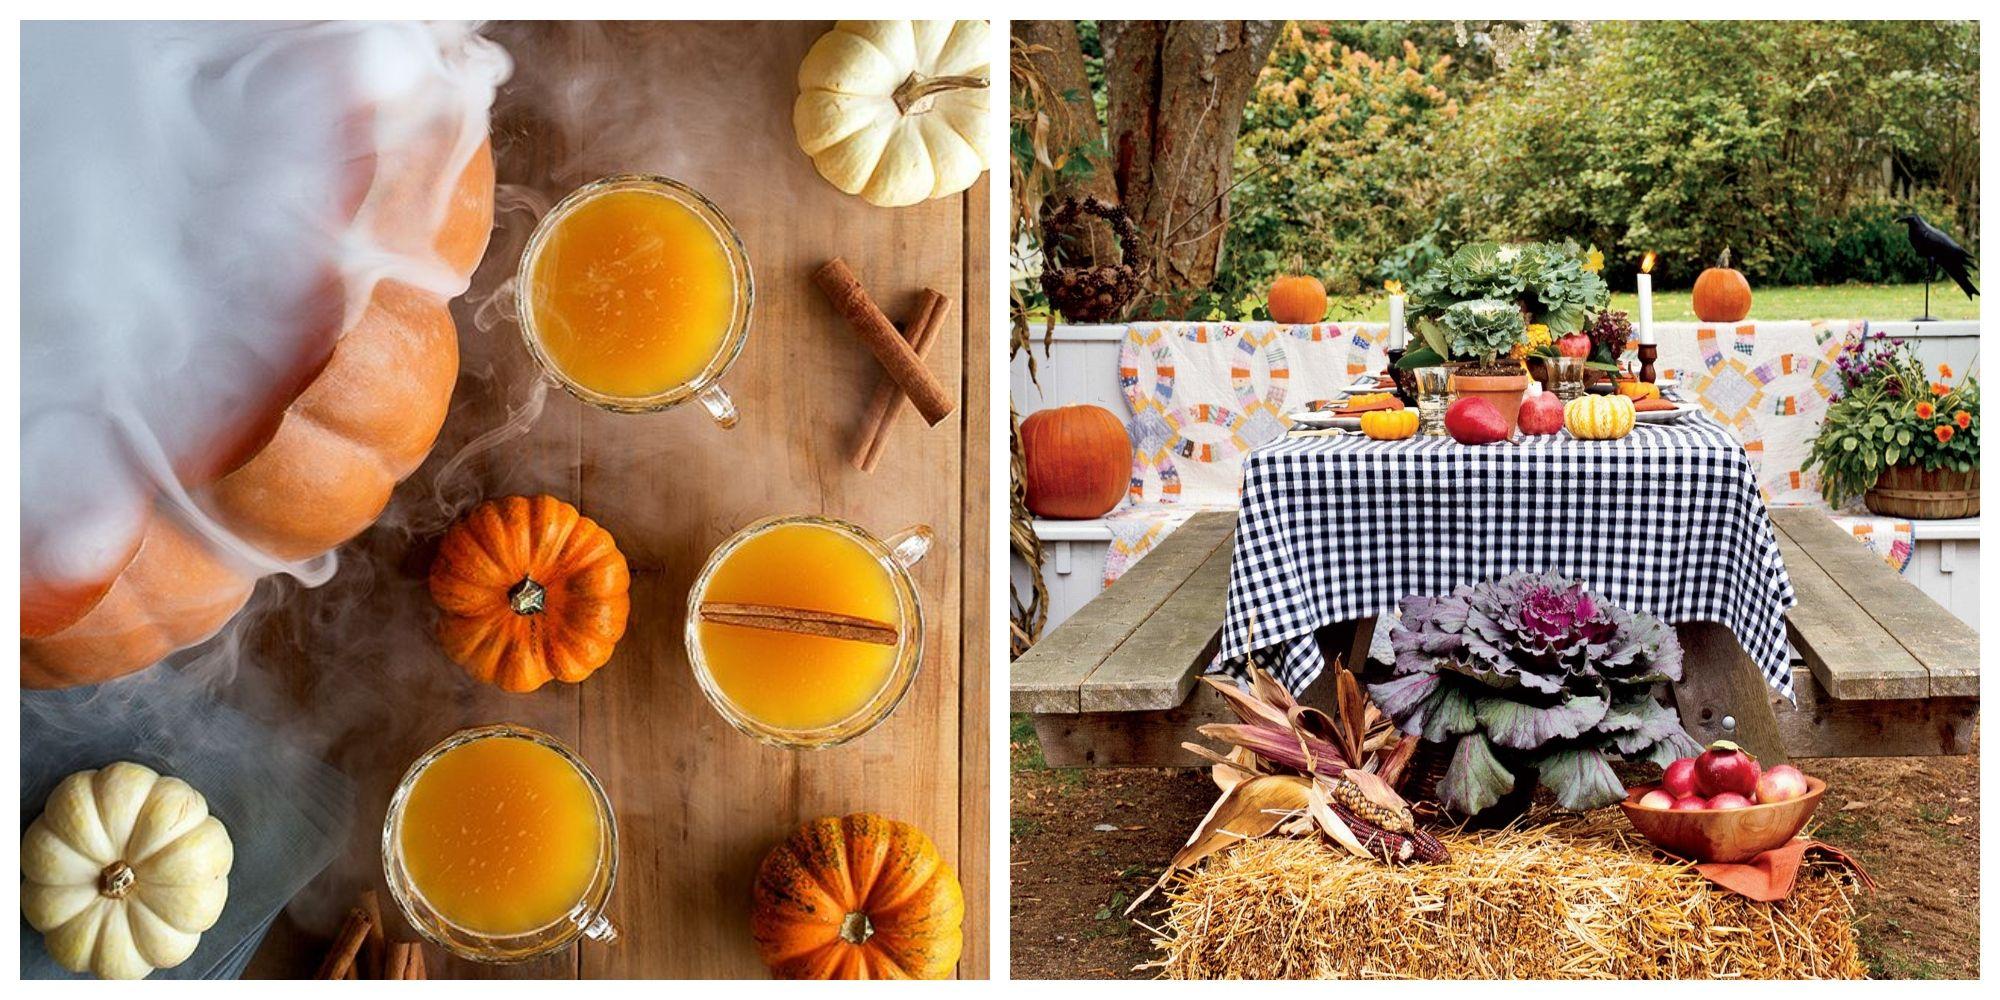 Cute Halloween Ideas 2018   Fun Halloween Decor and Food